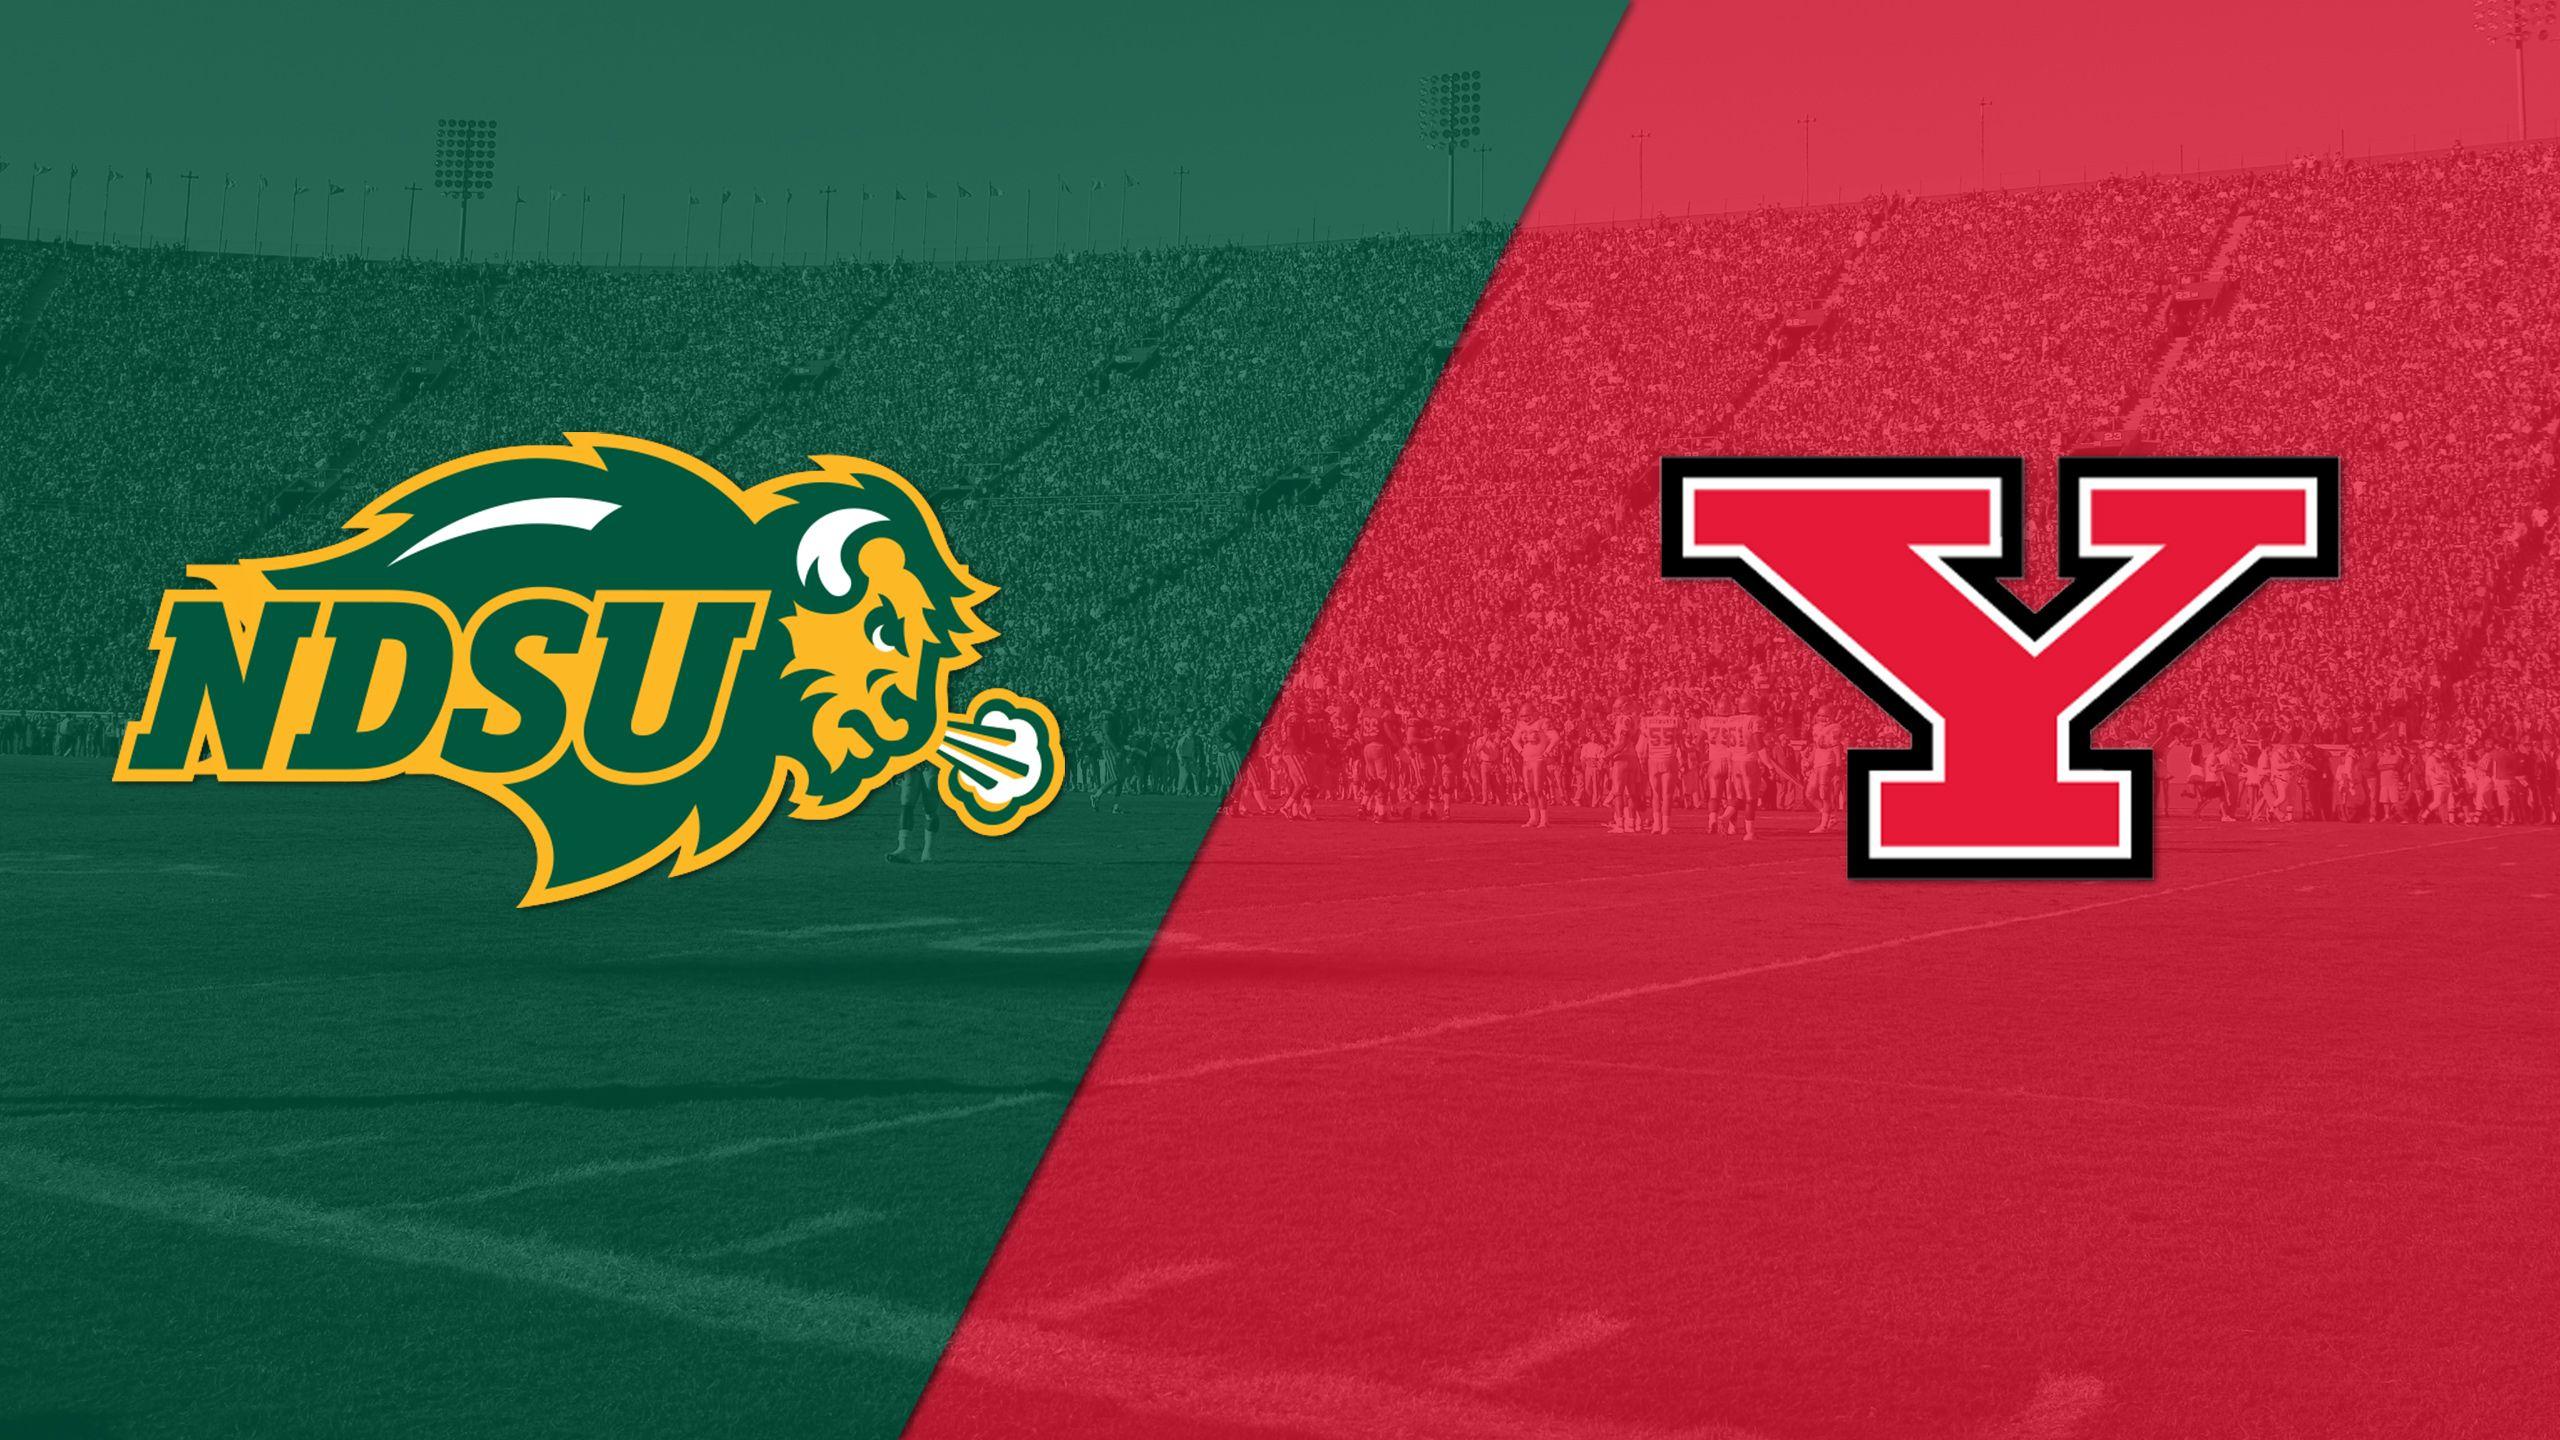 North Dakota State vs. Youngstown State (Football)